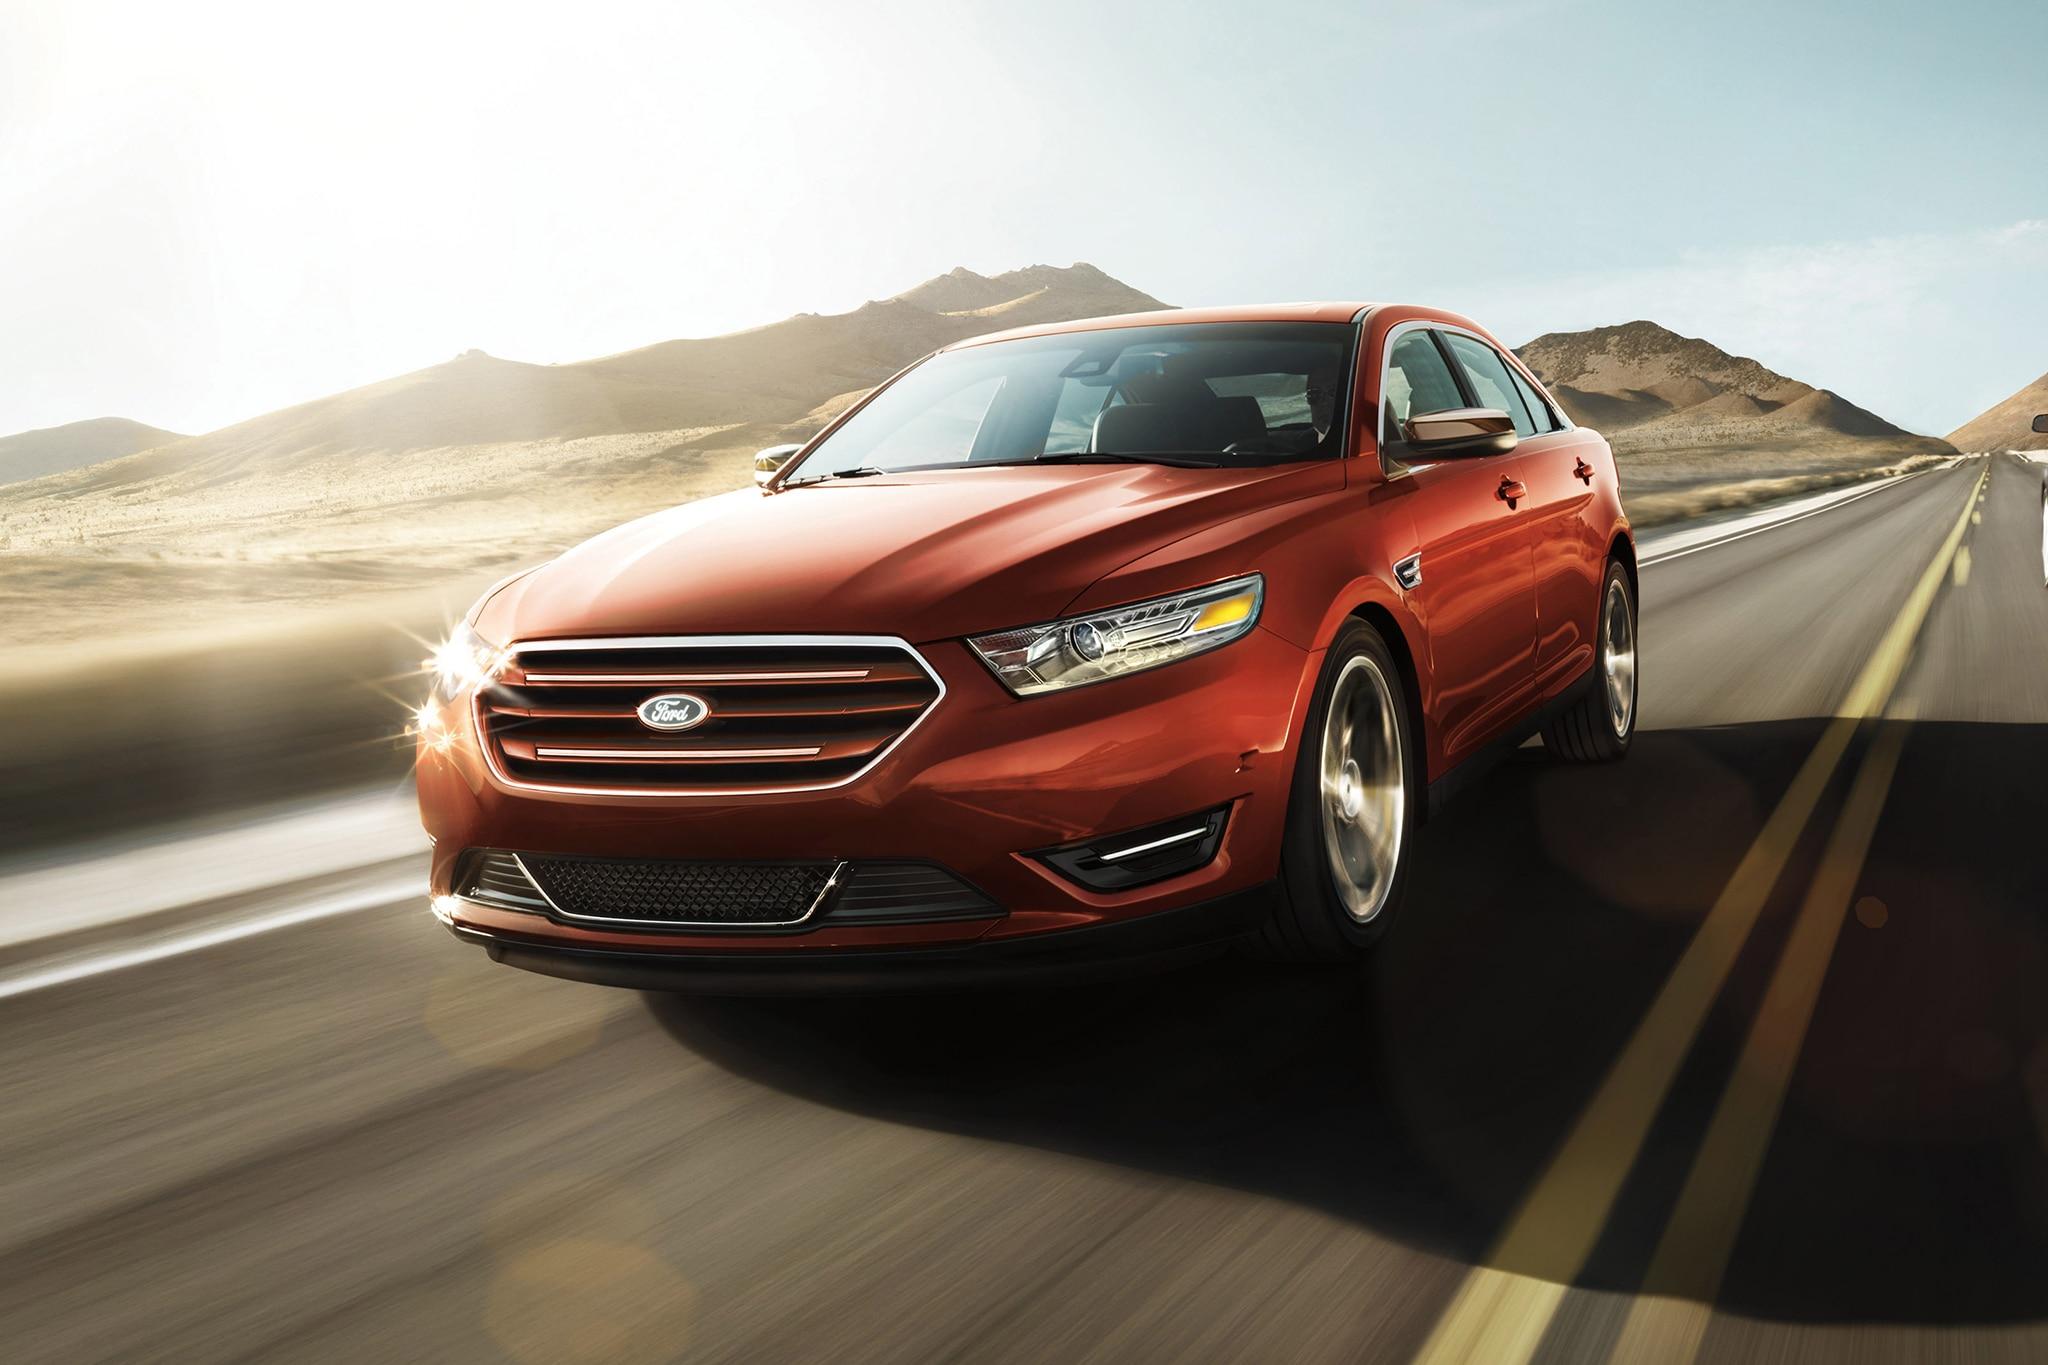 Nissan Dealers In Maine >> Recalls: Ford Escape, Explorer, Taurus; Nissan Rogue - Automobile